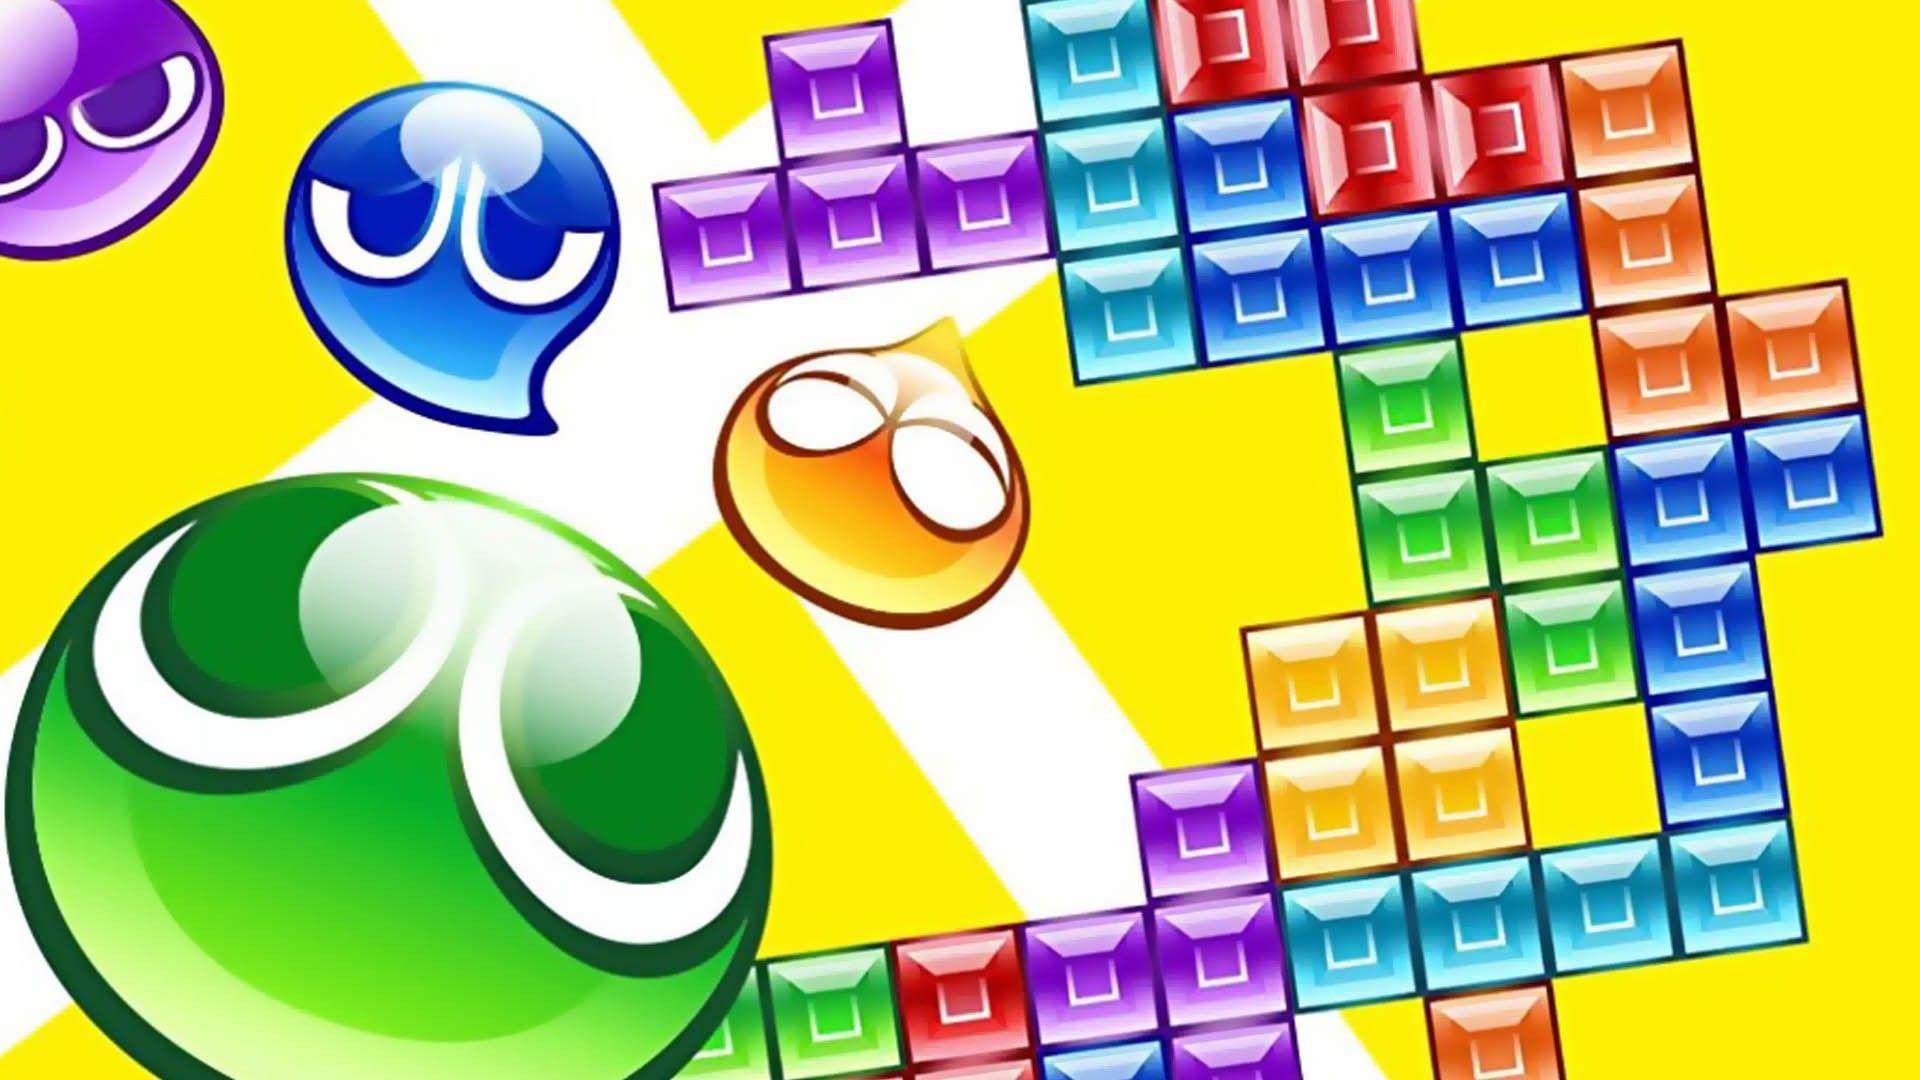 puyo puyo tetris 2 wallpaper 72485